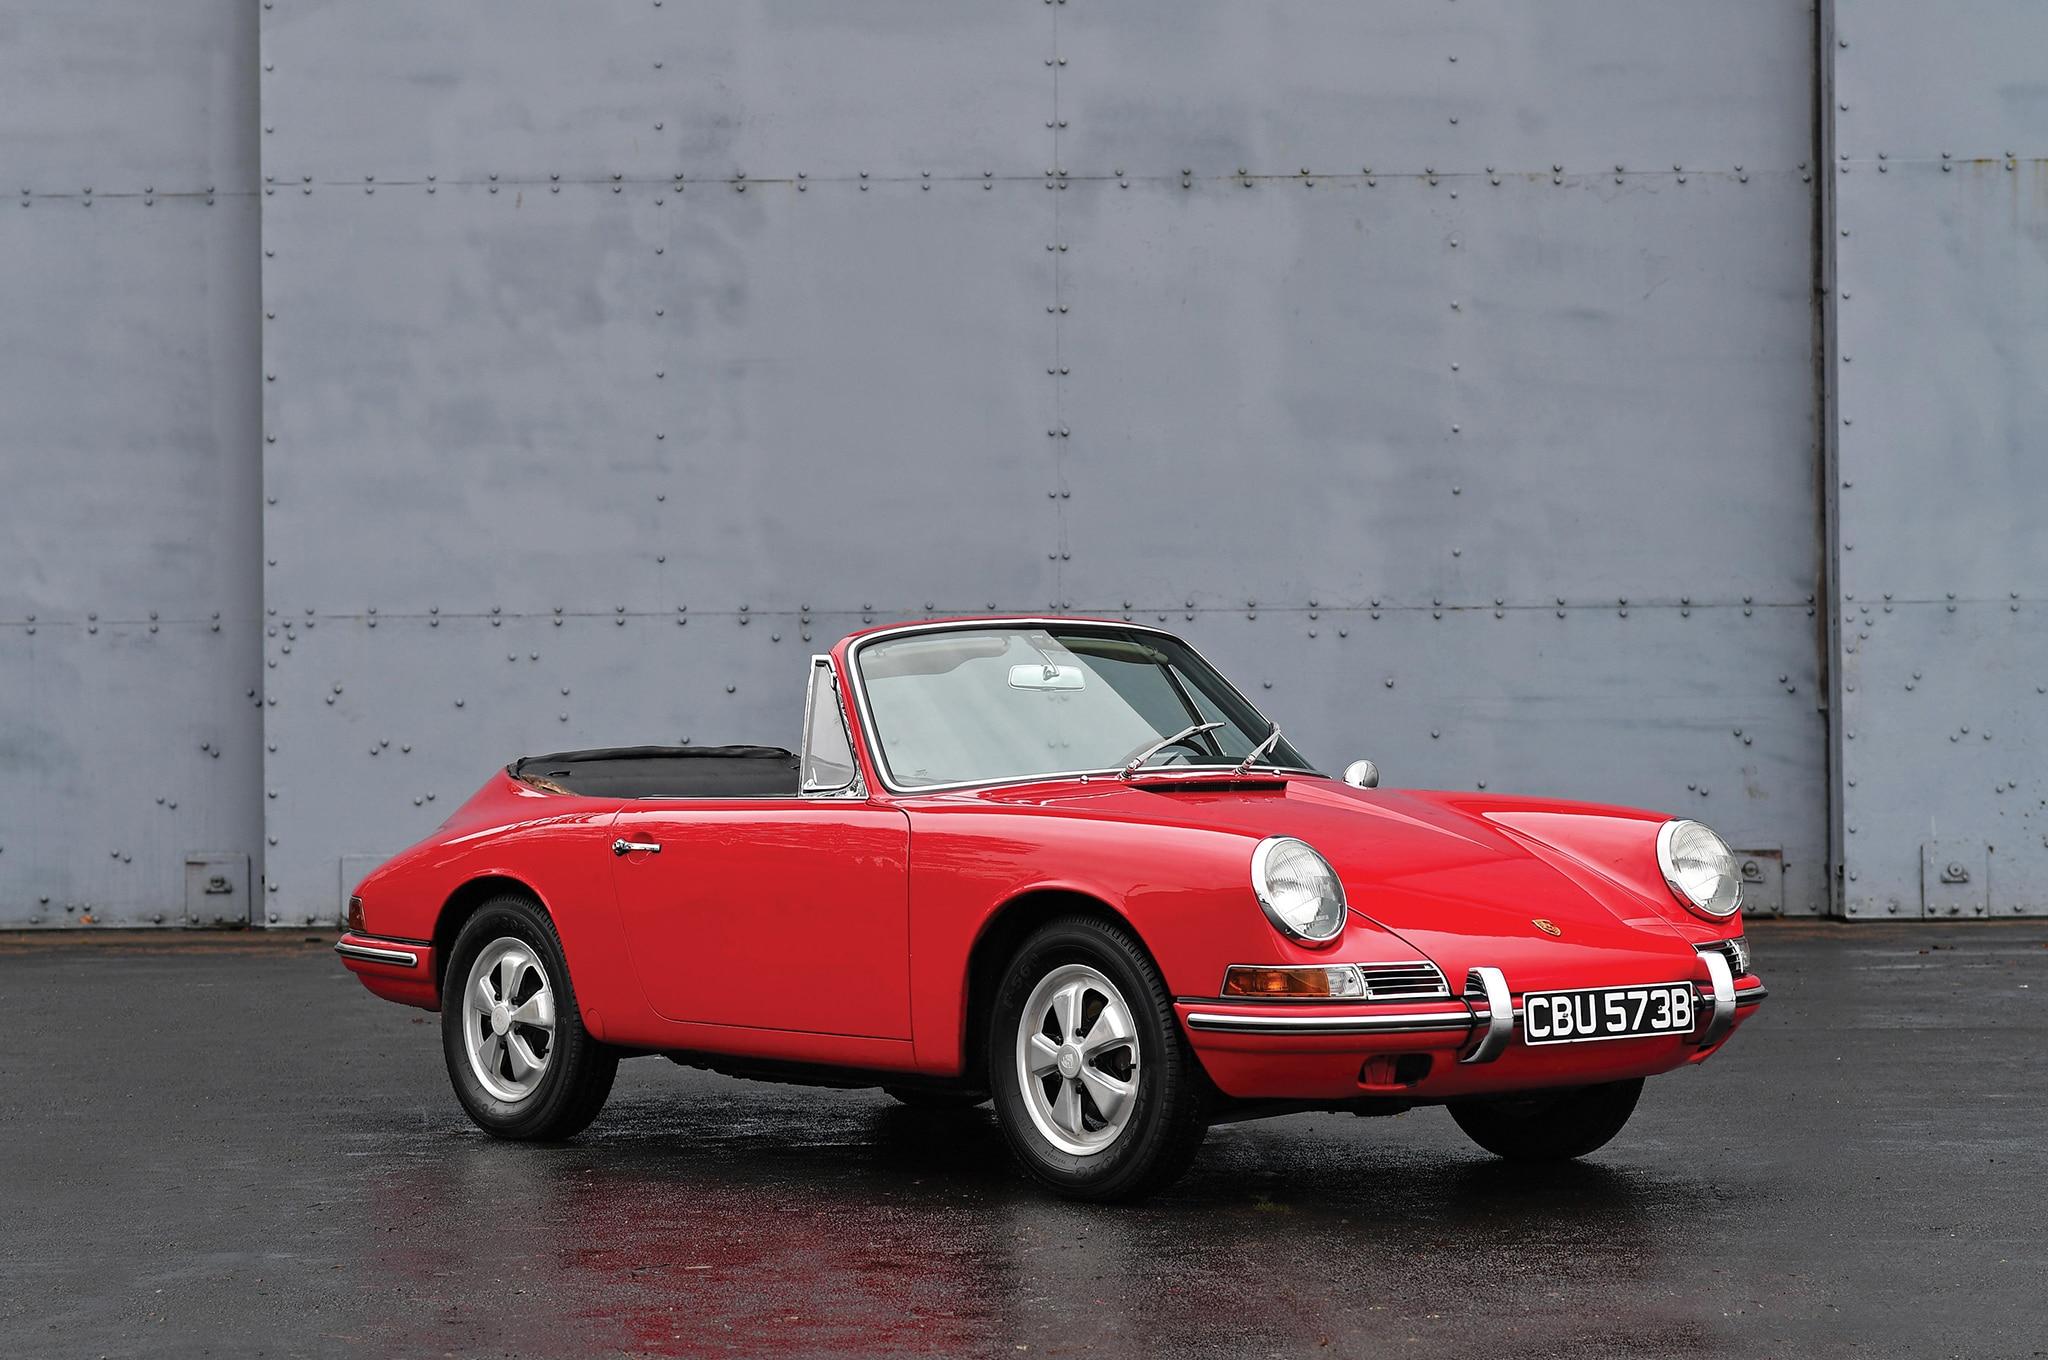 1964 Porsche 901 Cabriolet Prototype RM Sothebys Front Three Quarters